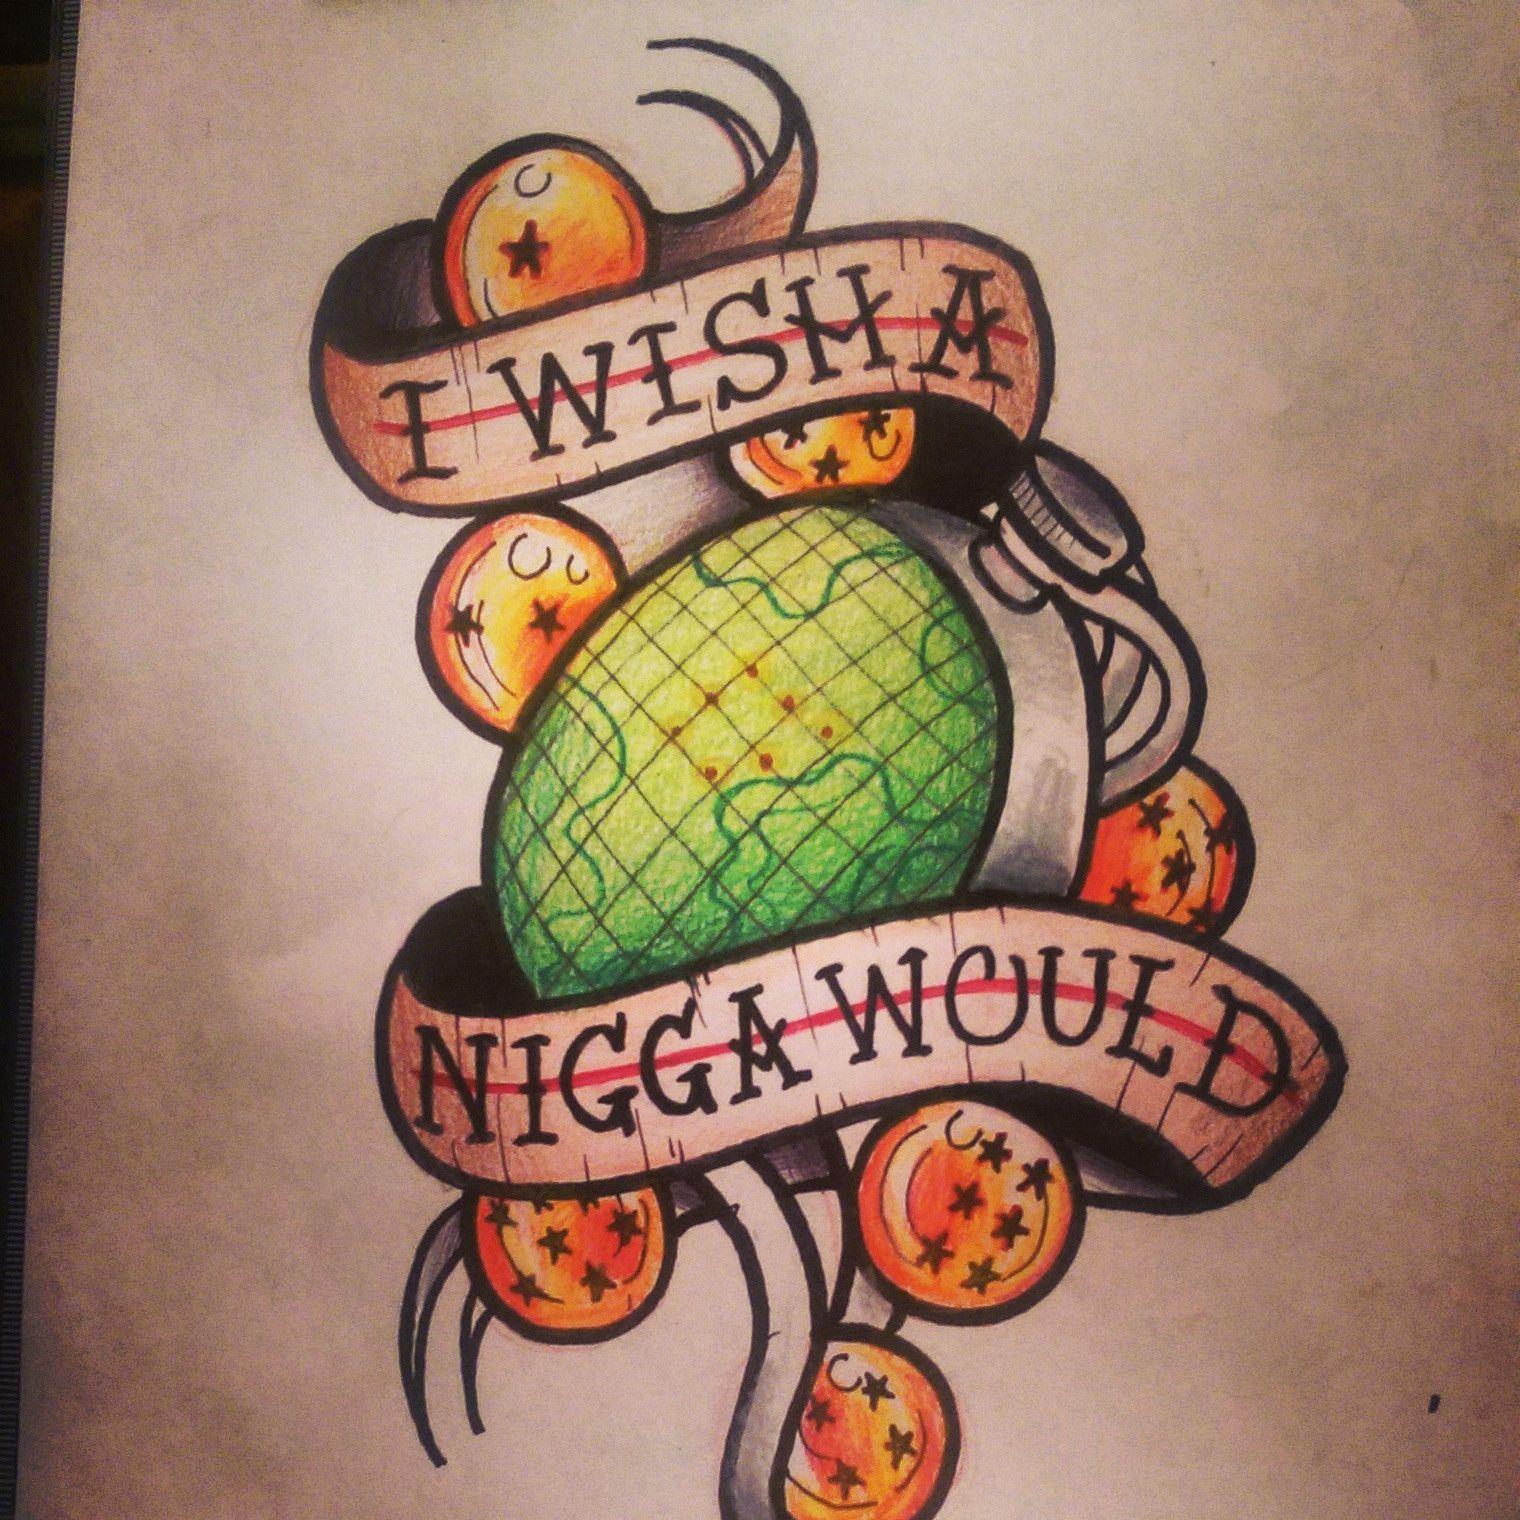 Dragon Ball Z Tattoo - Google Search